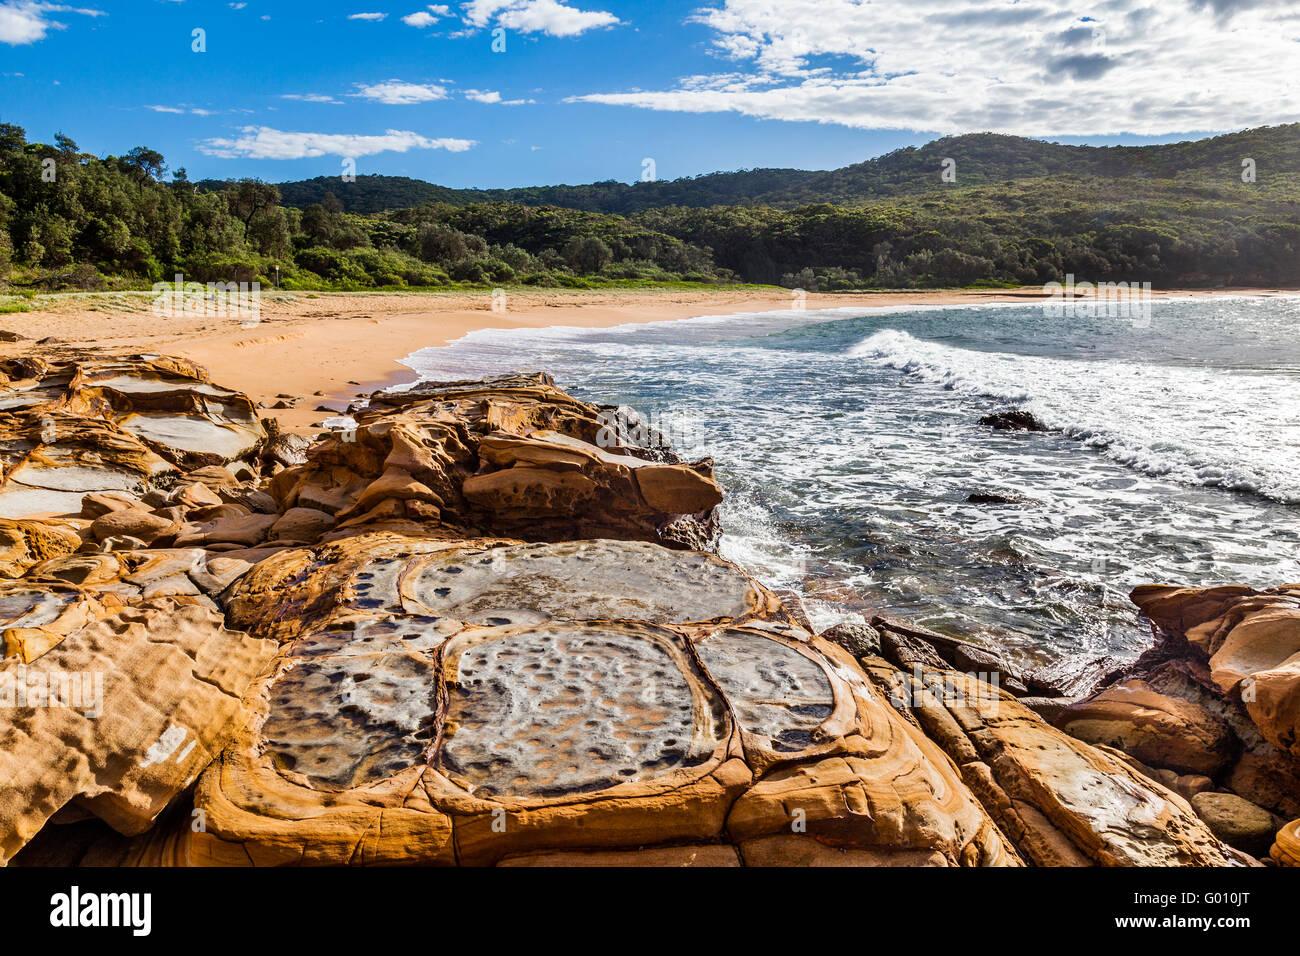 Australia, New South Wales, Central Coast, Bouddi National Park, beach and rock platform at Maitland Bay. - Stock Image